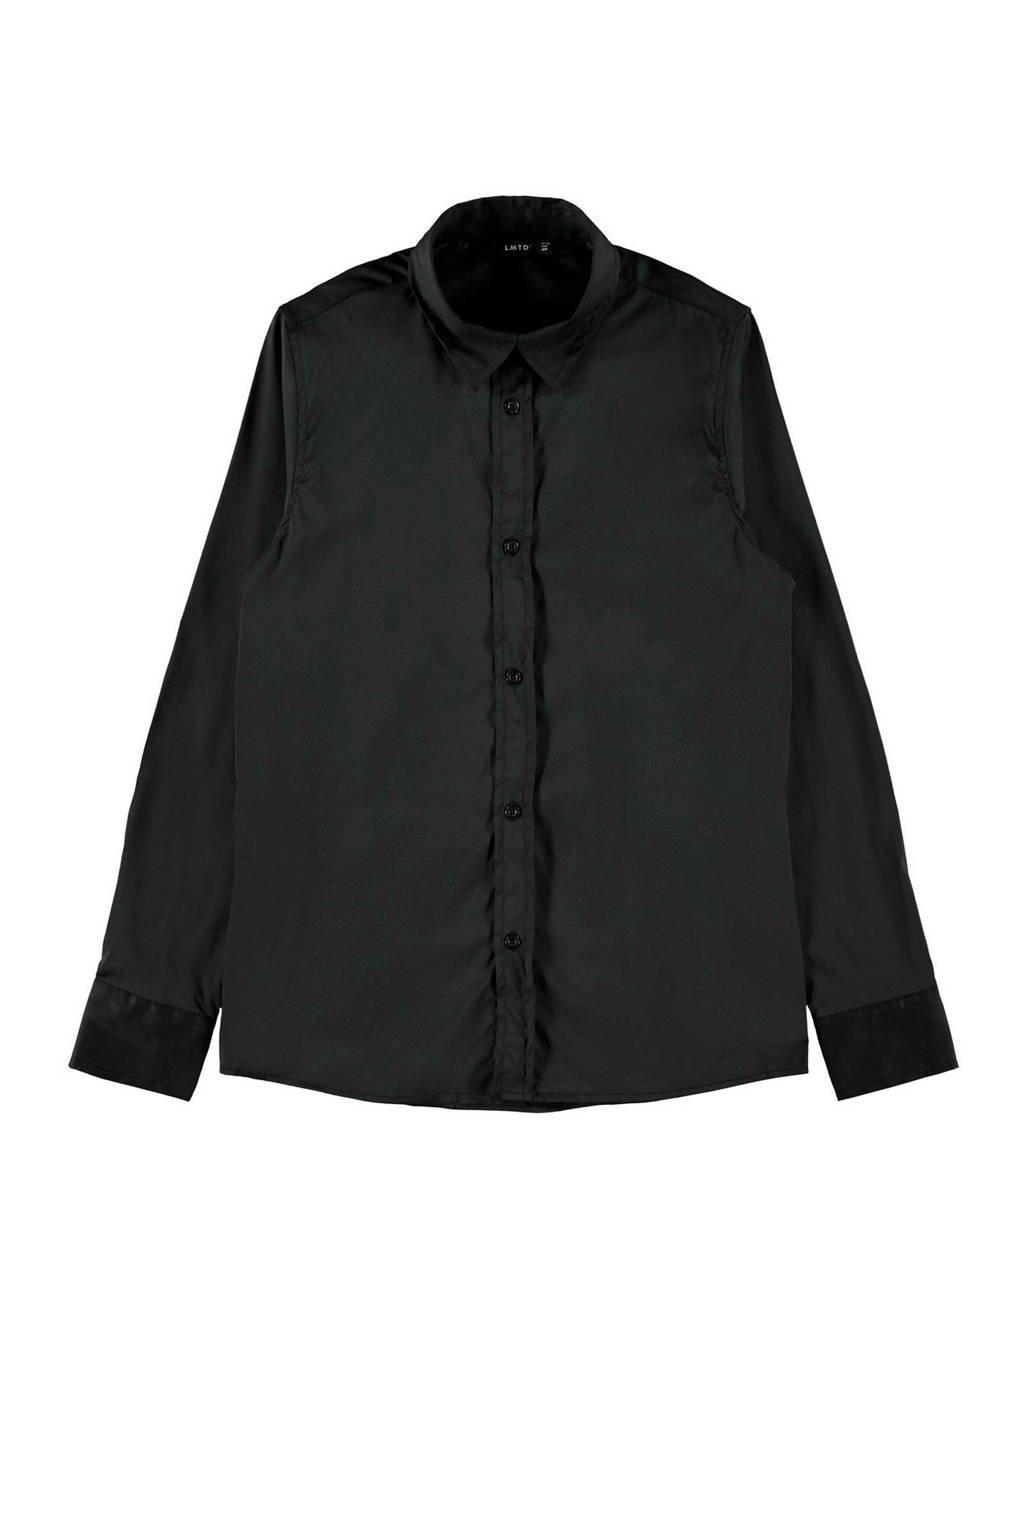 LMTD overhemd zwart, Zwart